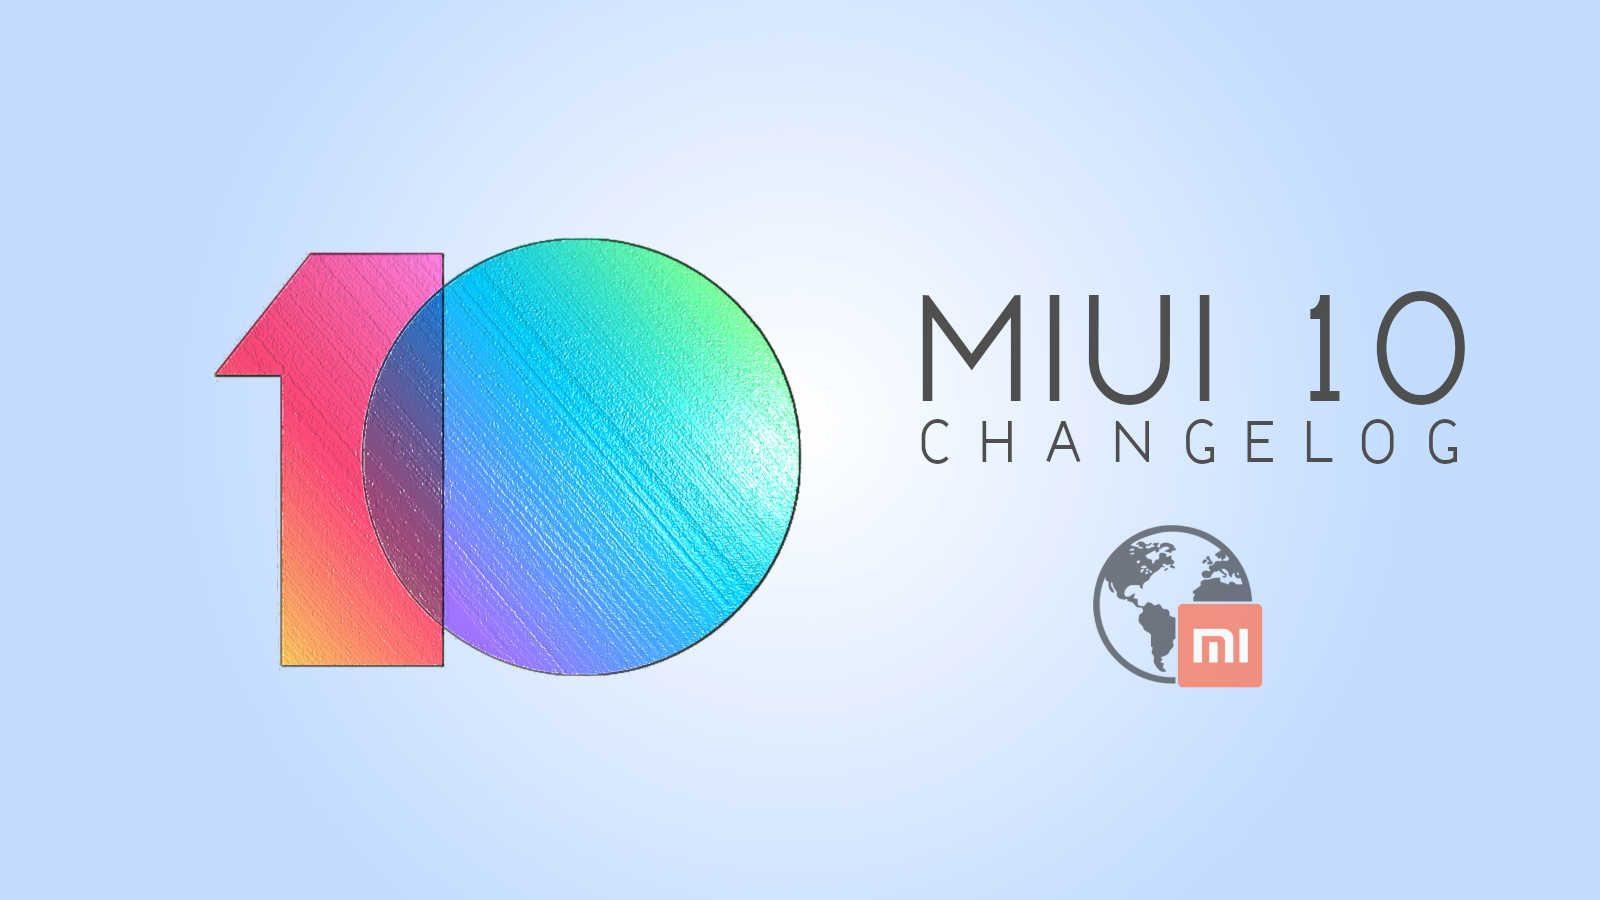 cropped-mi-globe.com_miui_changelog2-5.jpg